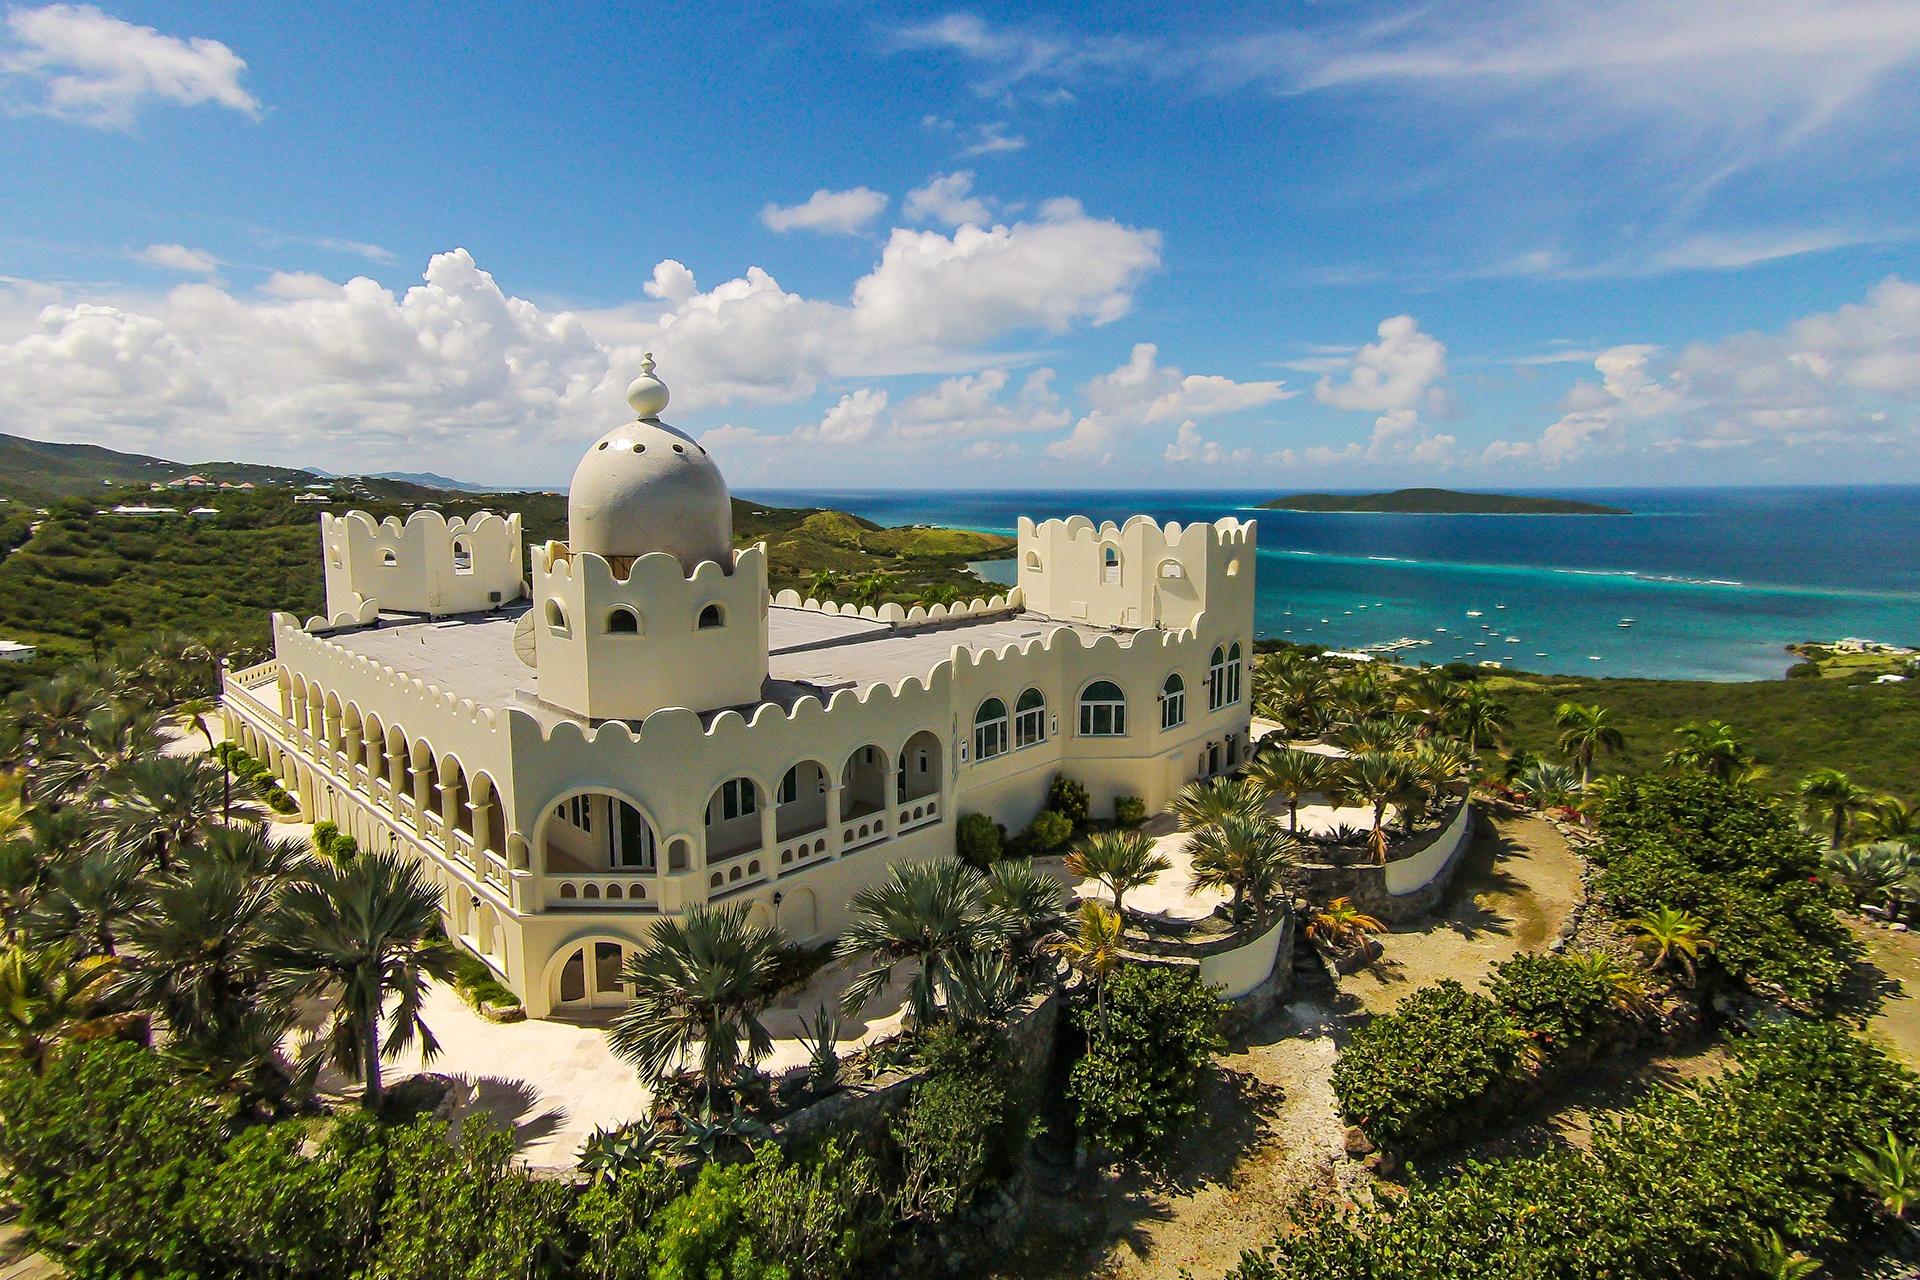 Mountaintop Castle on the Coast of St. Croix, US Virgin Islands